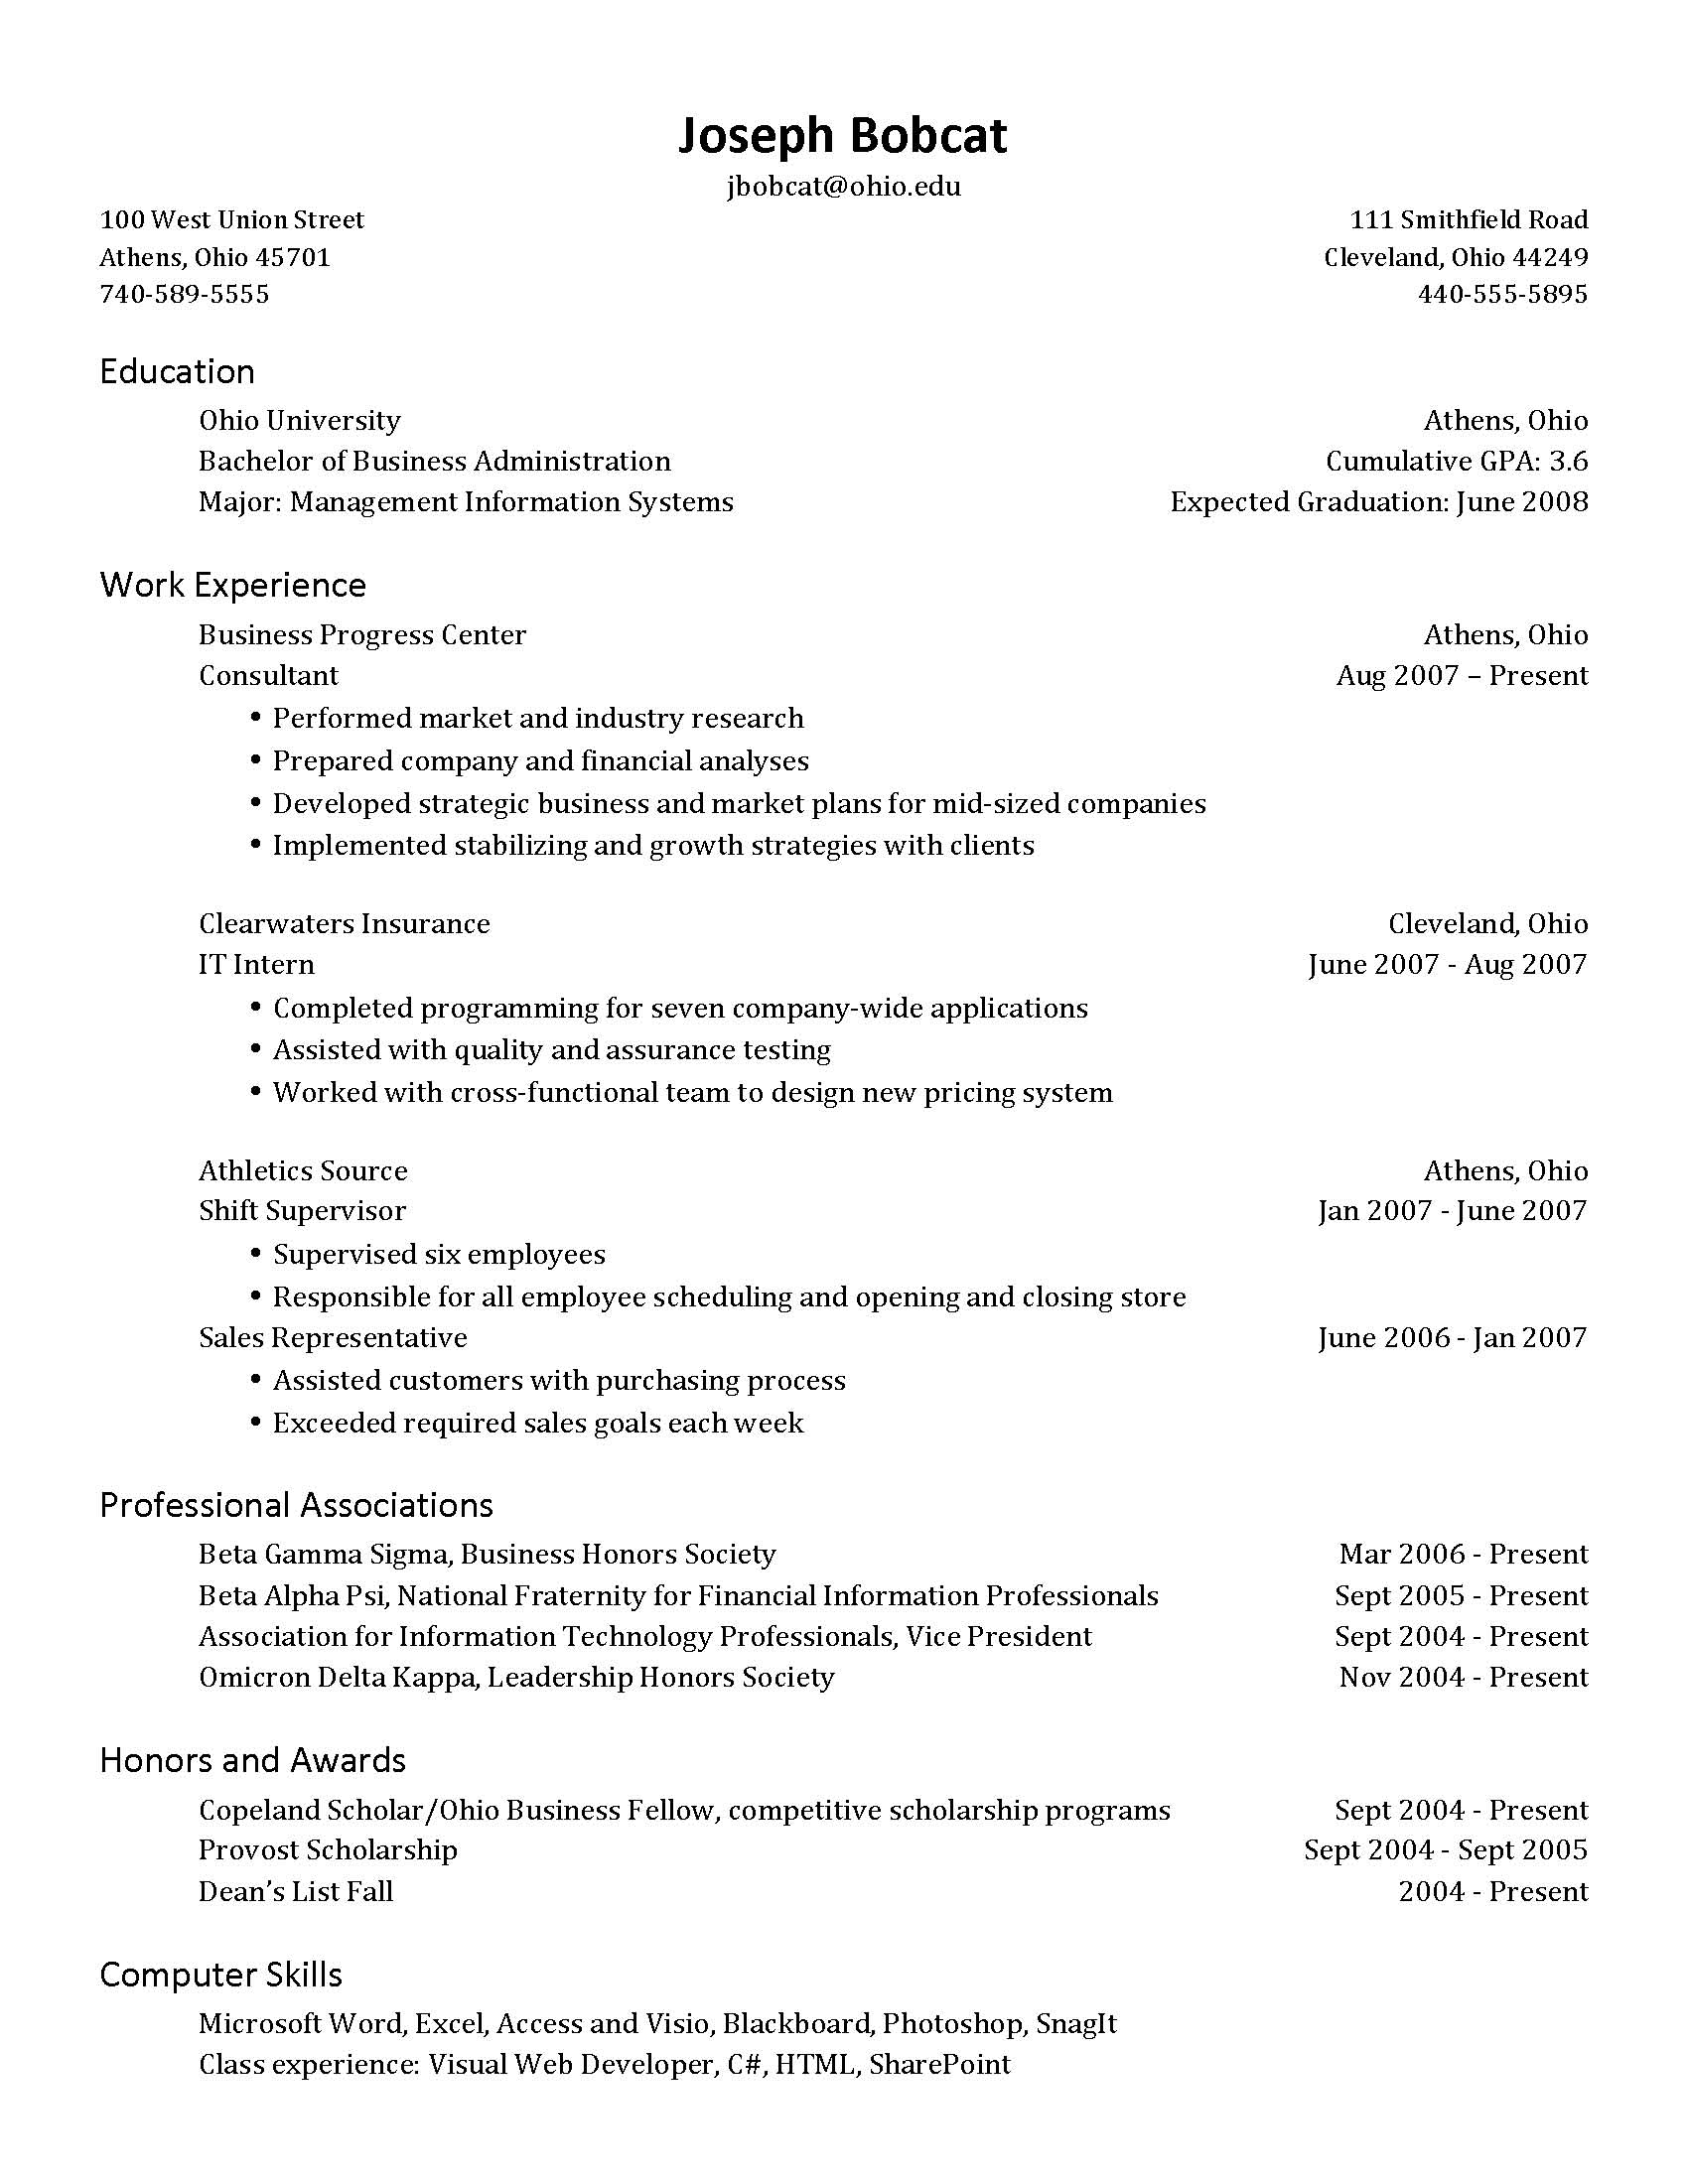 resume address on one line